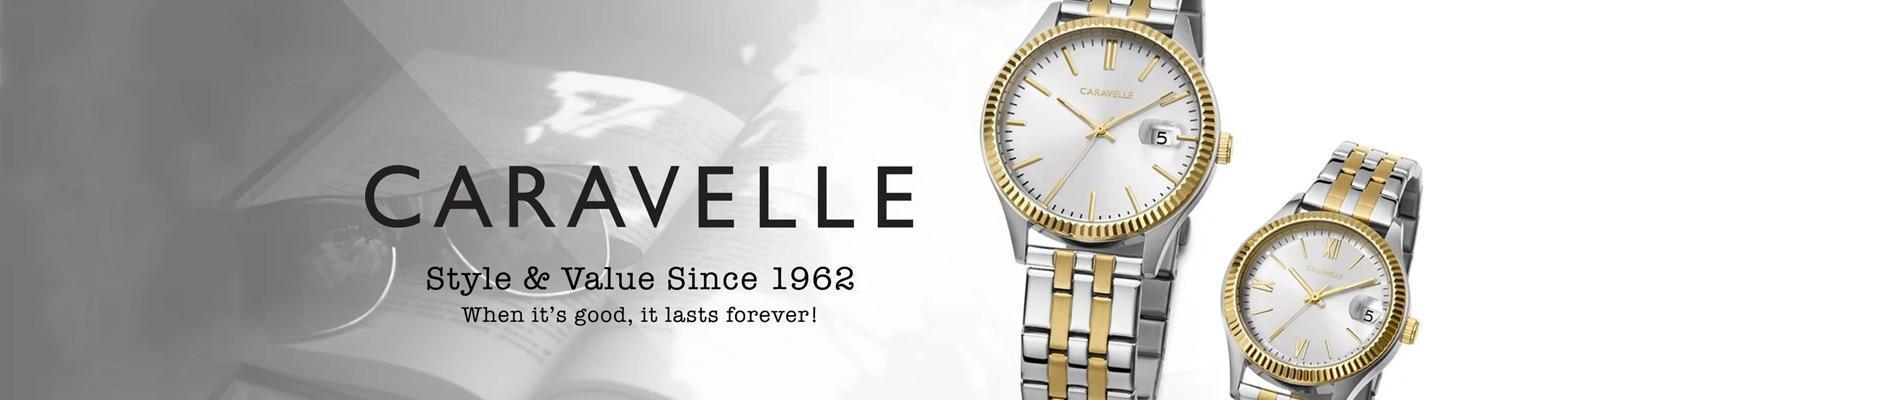 đồng hồ caravelle